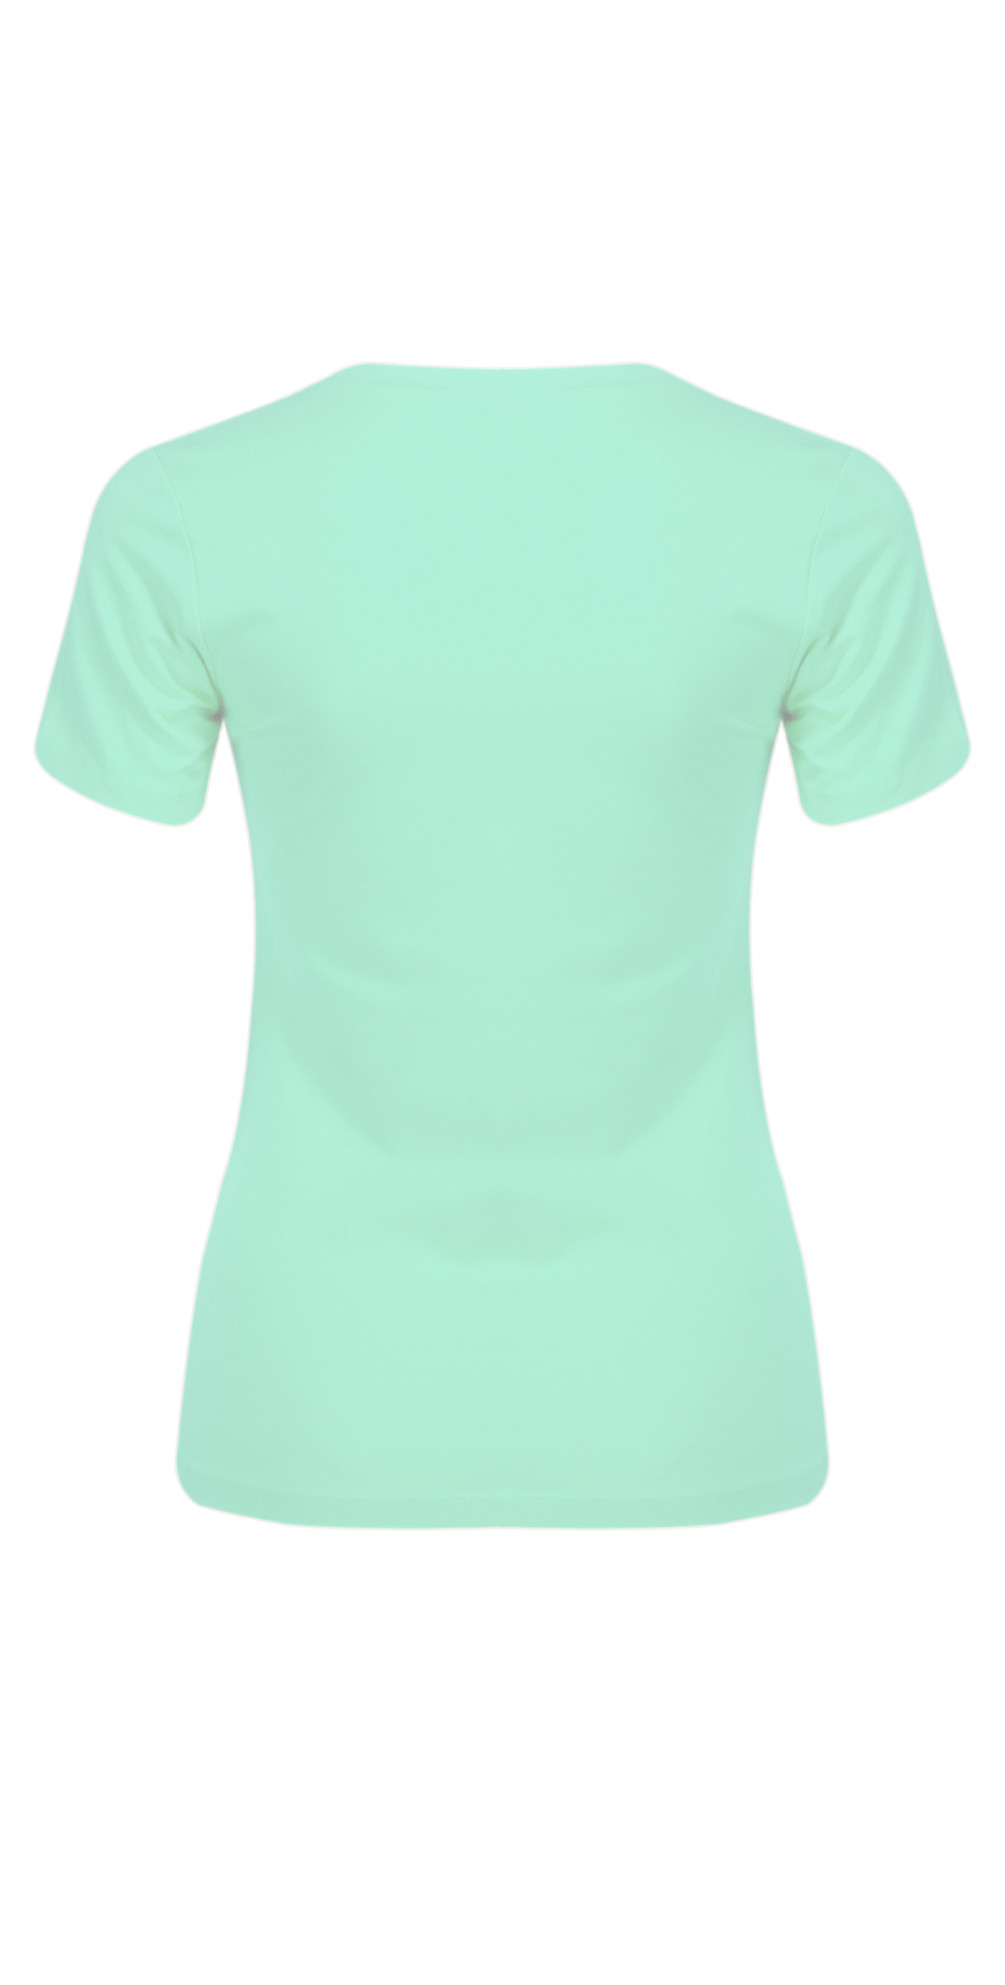 Jackpot clothing online